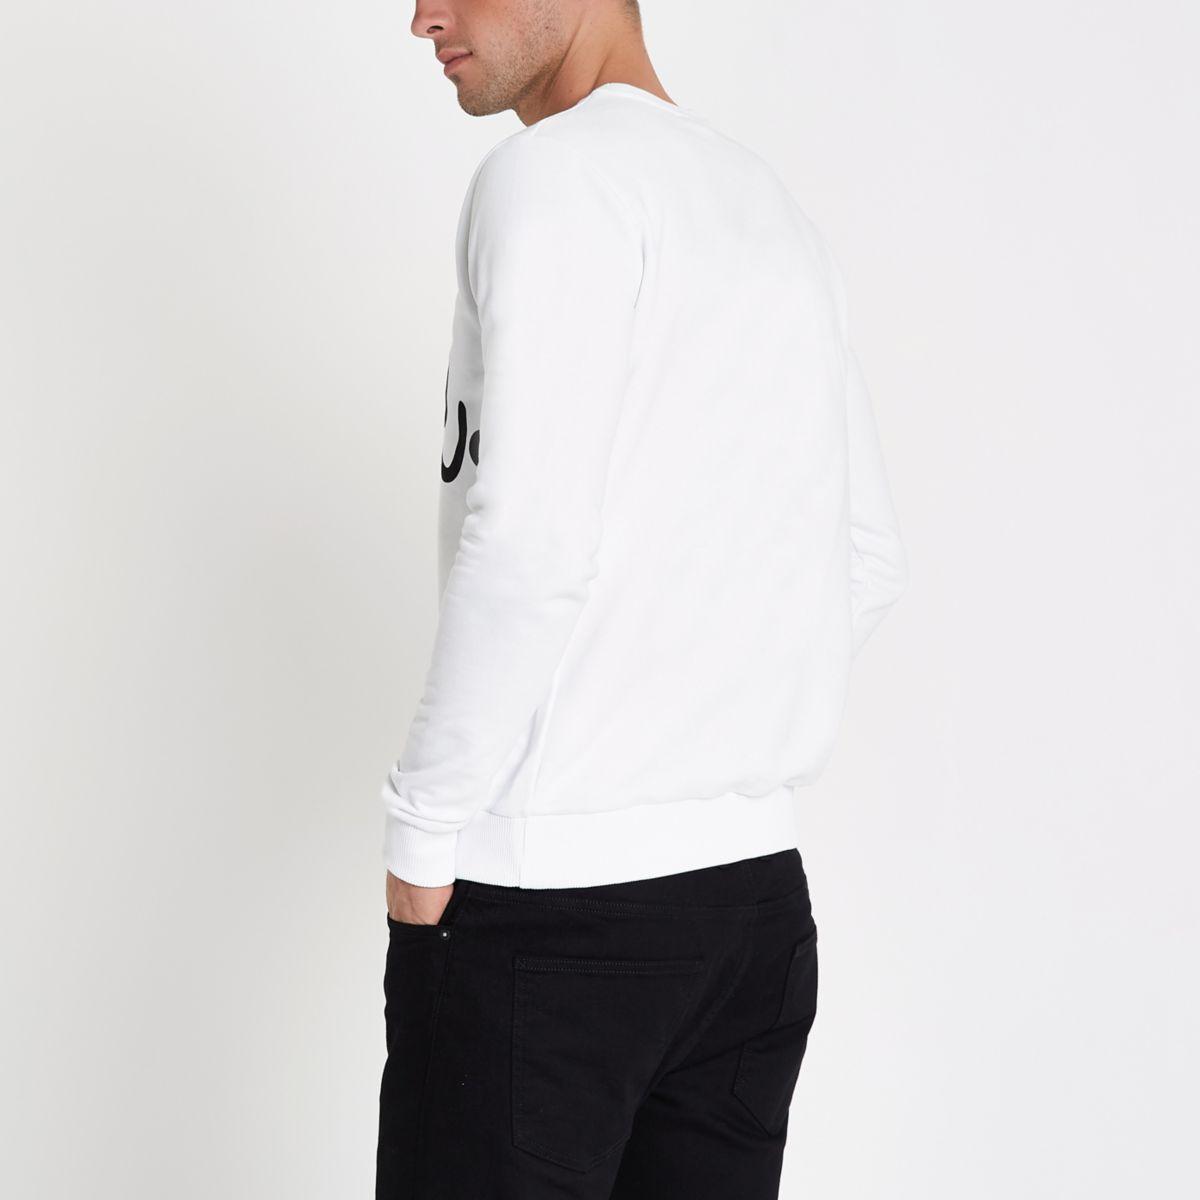 sweatshirt white neck sweatshirt neck crew white Hype Hype crew dHna60qx0